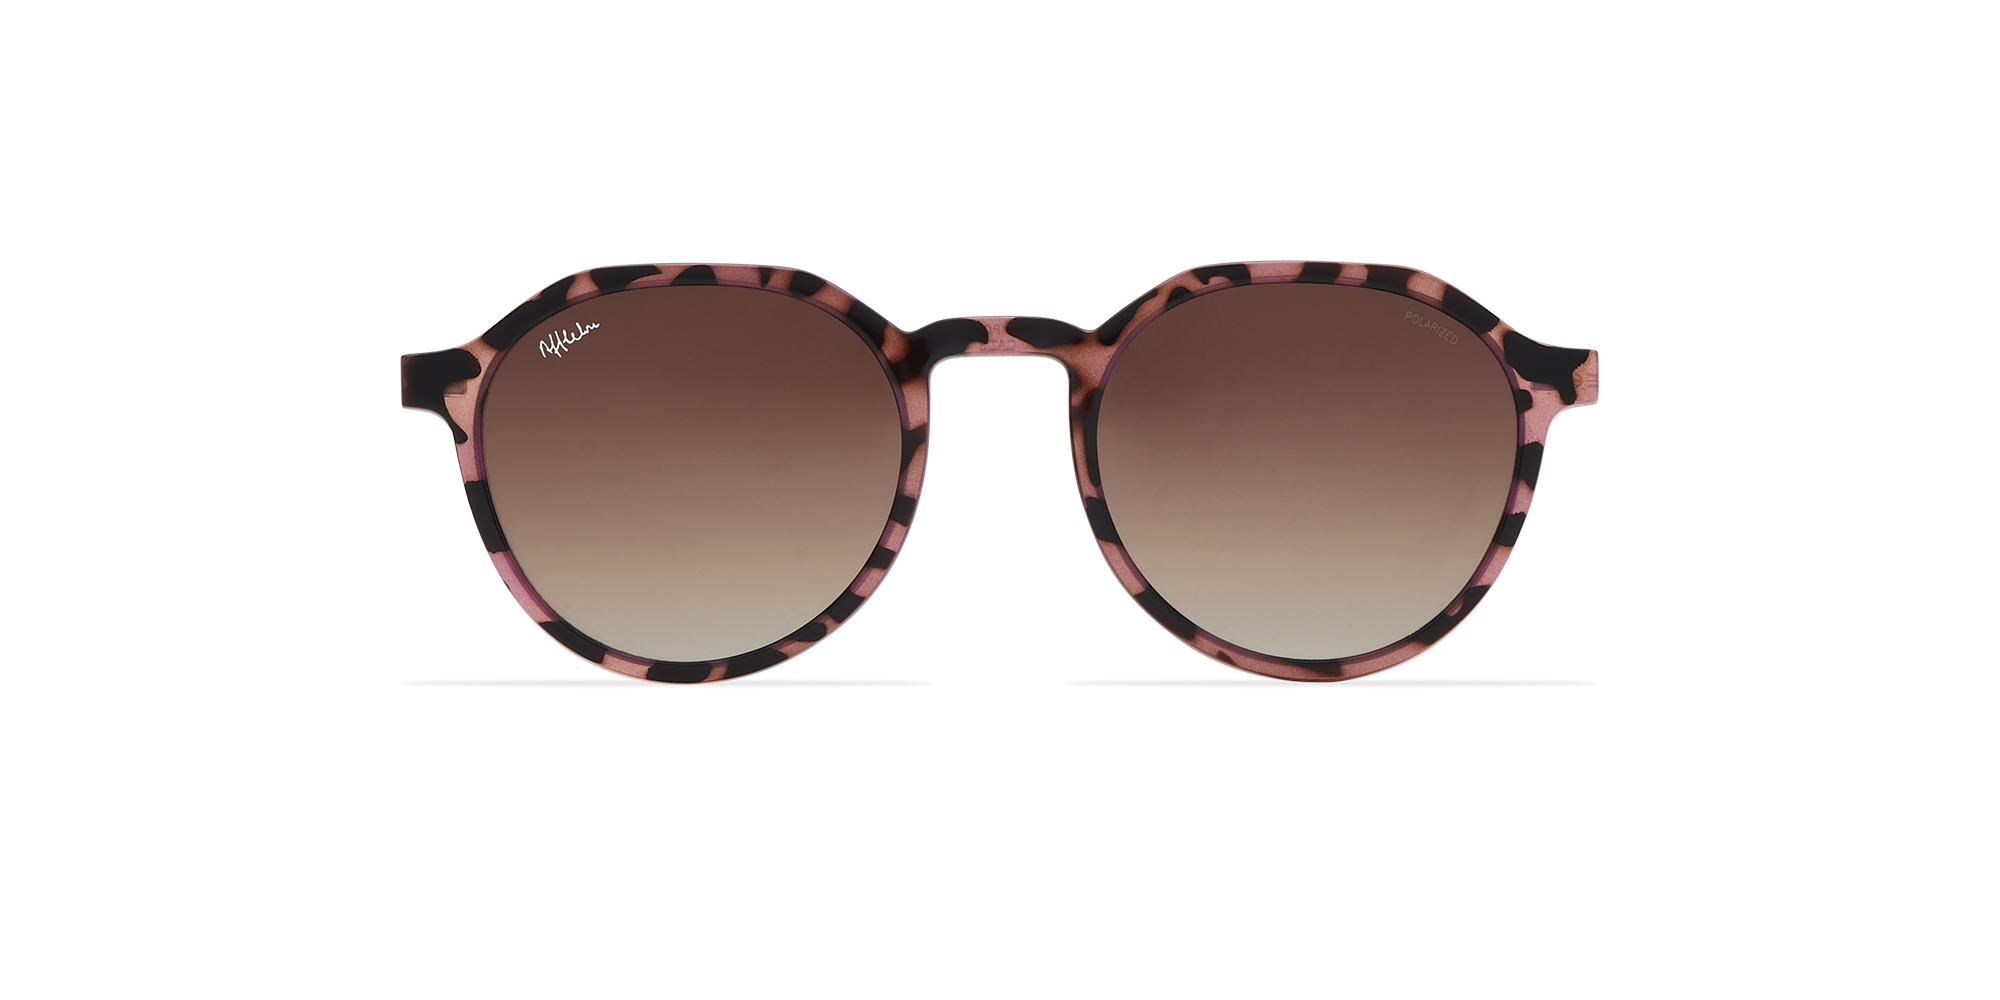 afflelou/france/products/smart_clip/clips_glasses/07630036428979_face.png